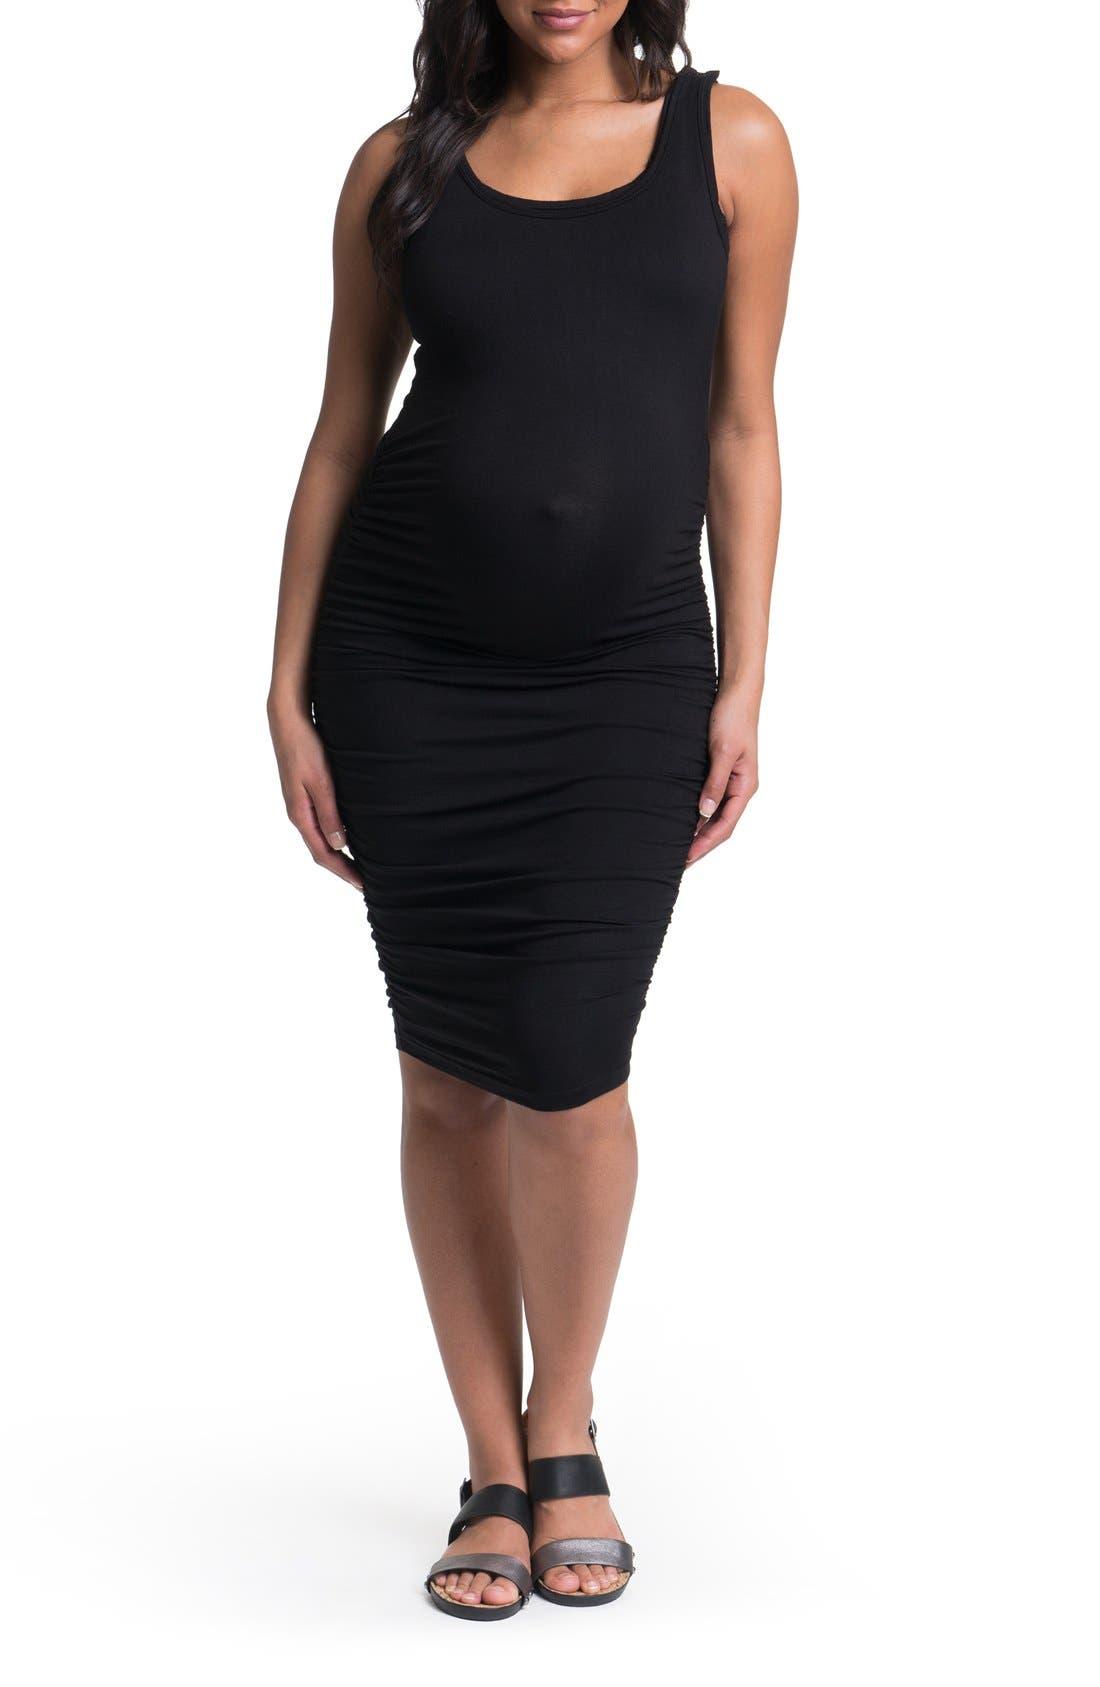 Bun Maternity Ruched Midi Tank Maternity Dress